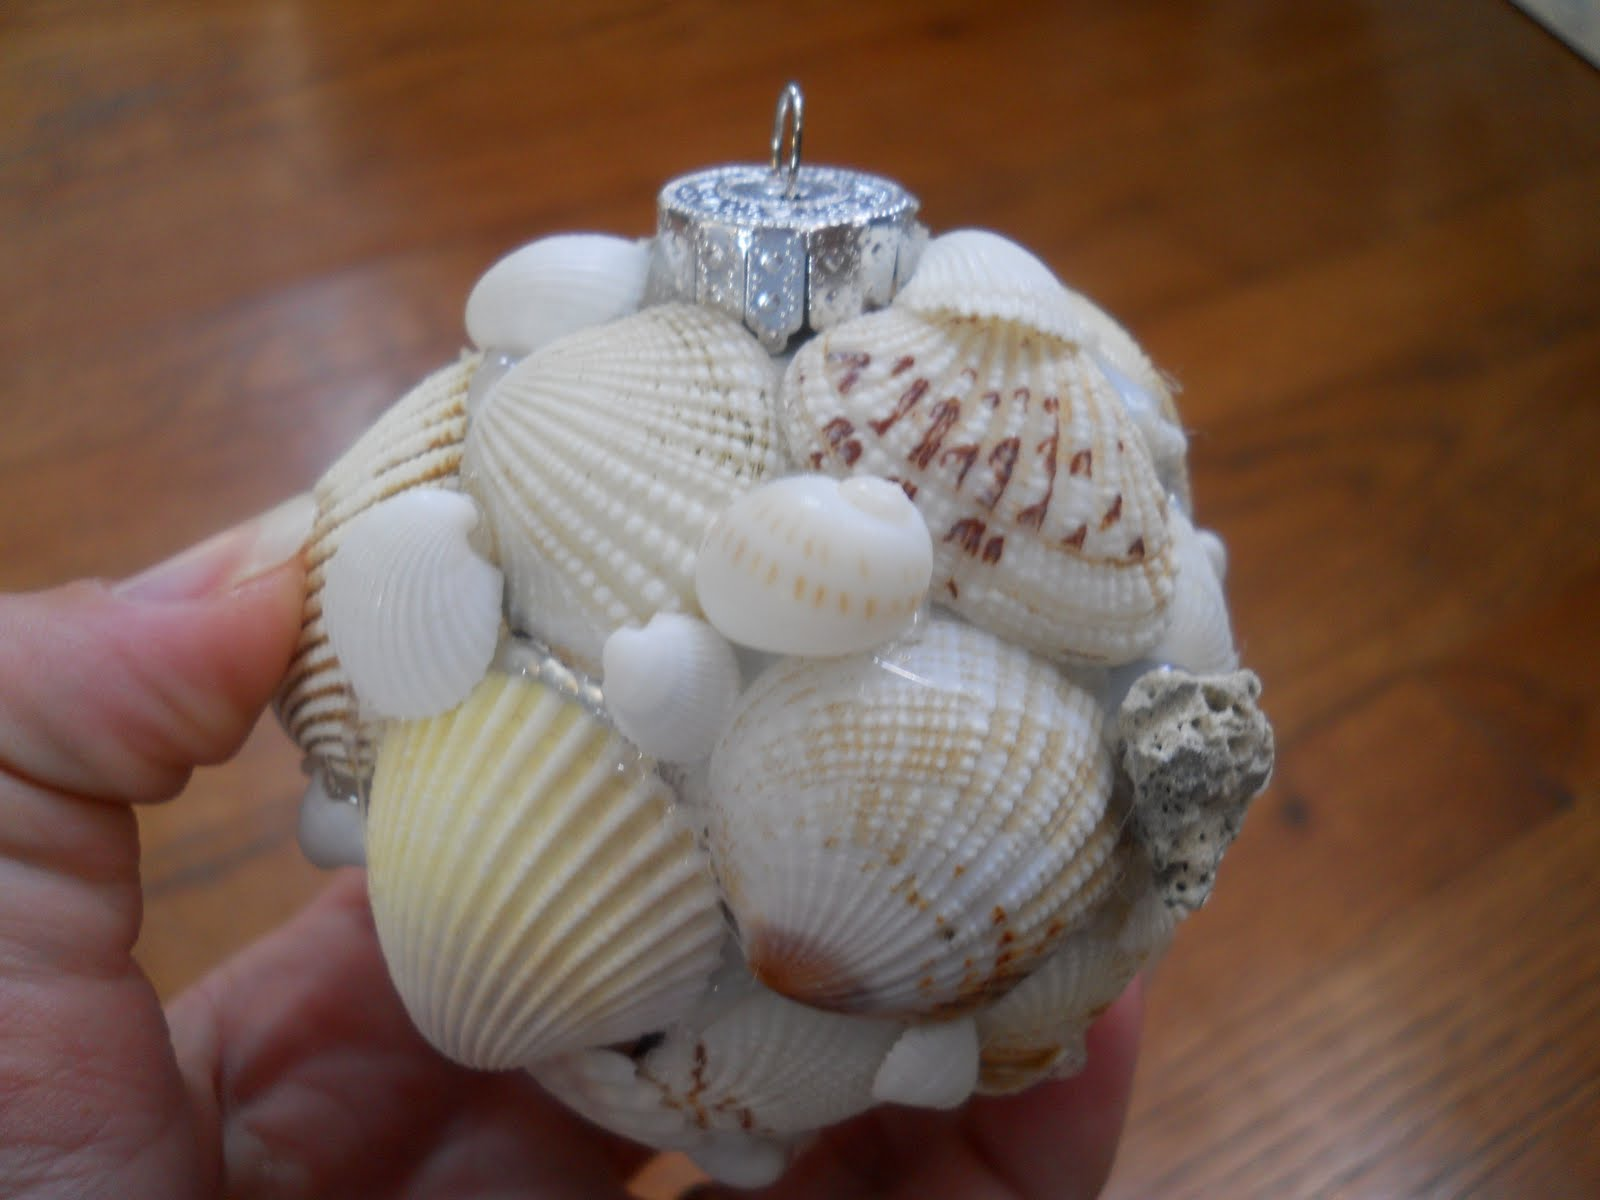 One woman 39 s walking shoes seashell christmas ornament - Seashell ornaments to make ...